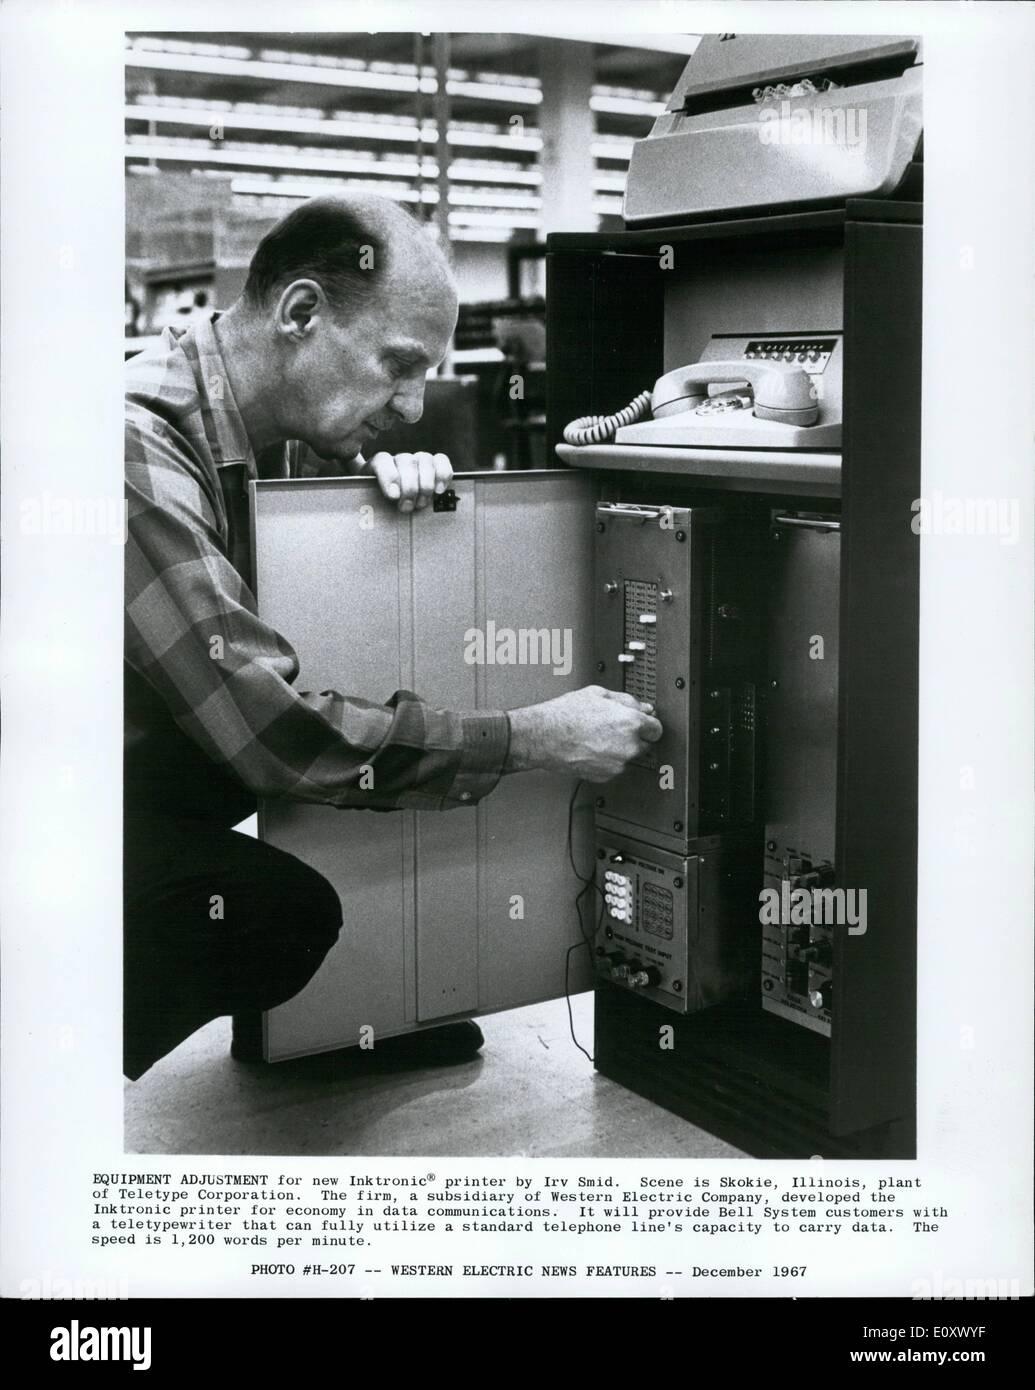 Dec. 12, 1967 - Equipment adjustment for new Inktronic printer by Irv Smid. Scene is Skokie, Illinois, plant of - Stock Image